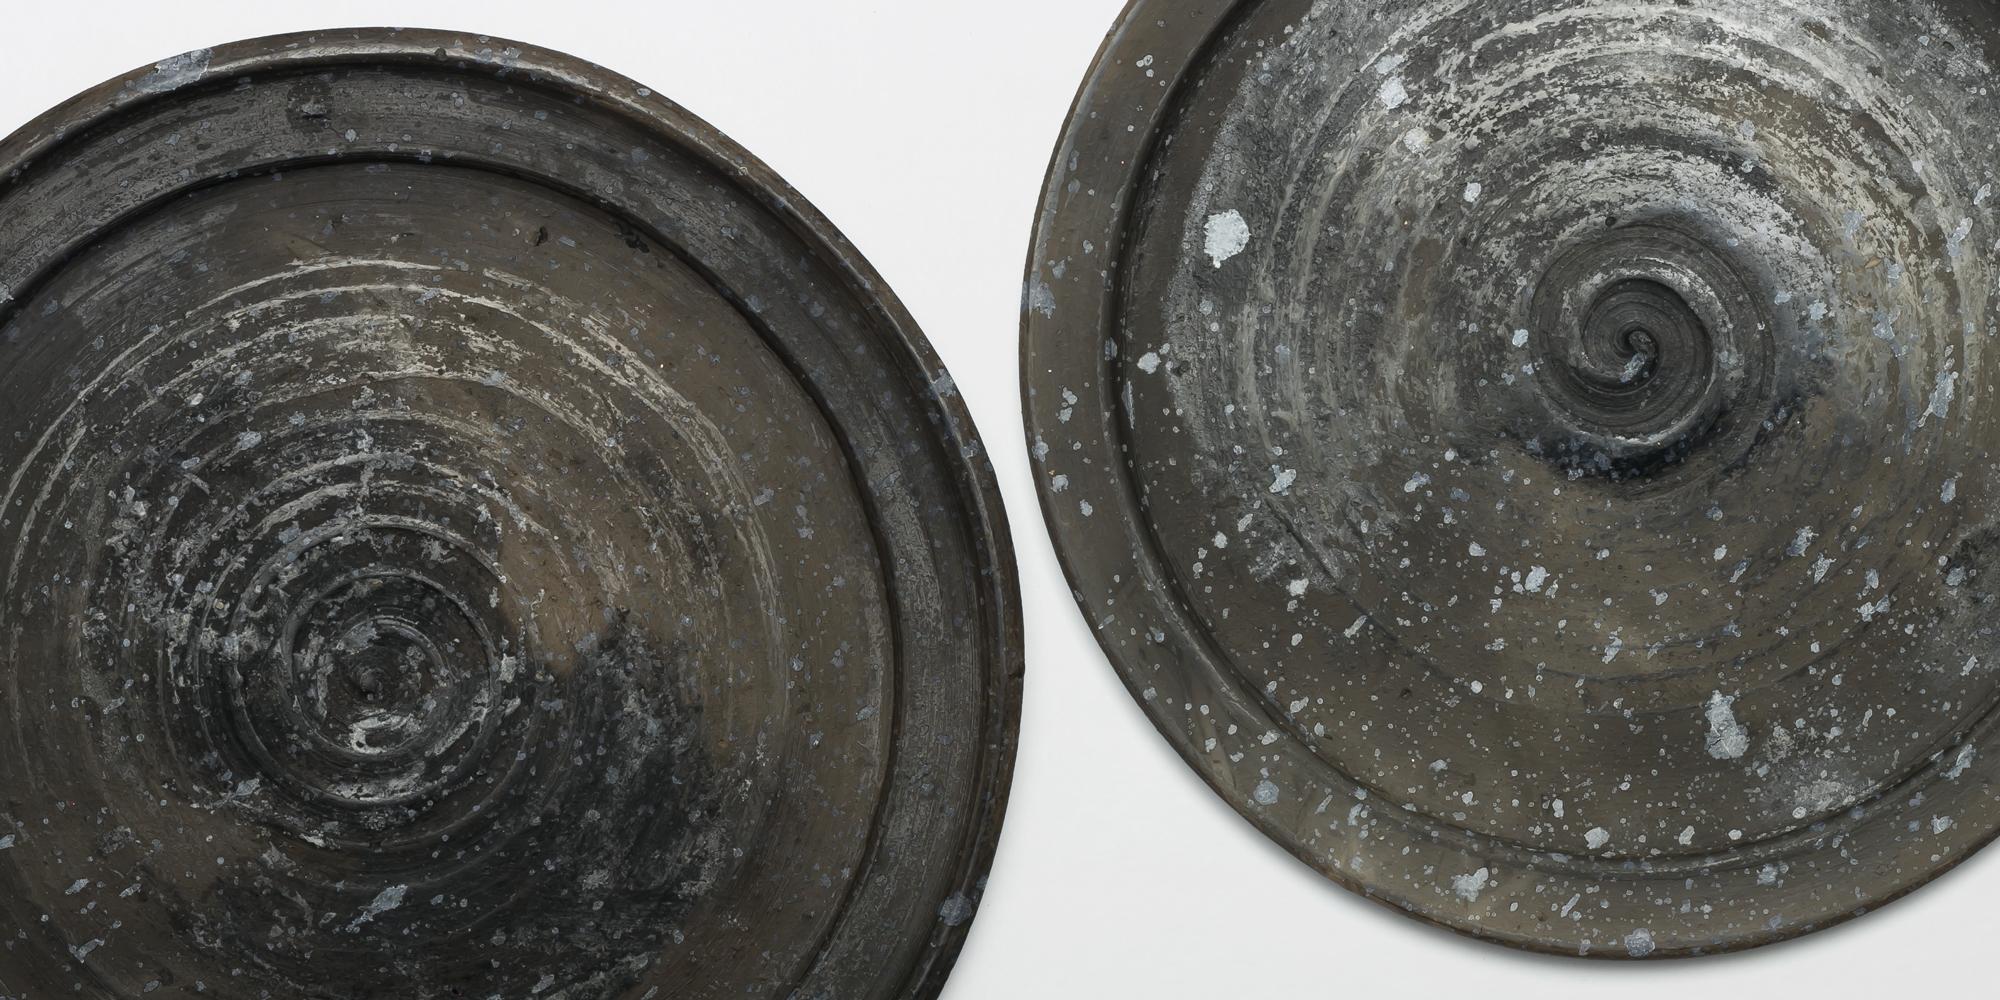 KYLLIKKI SALMENHAARA,キィリッキ・サルメンハアラ,arabia,arabia art department,finland,アラビアフィンランド,北欧